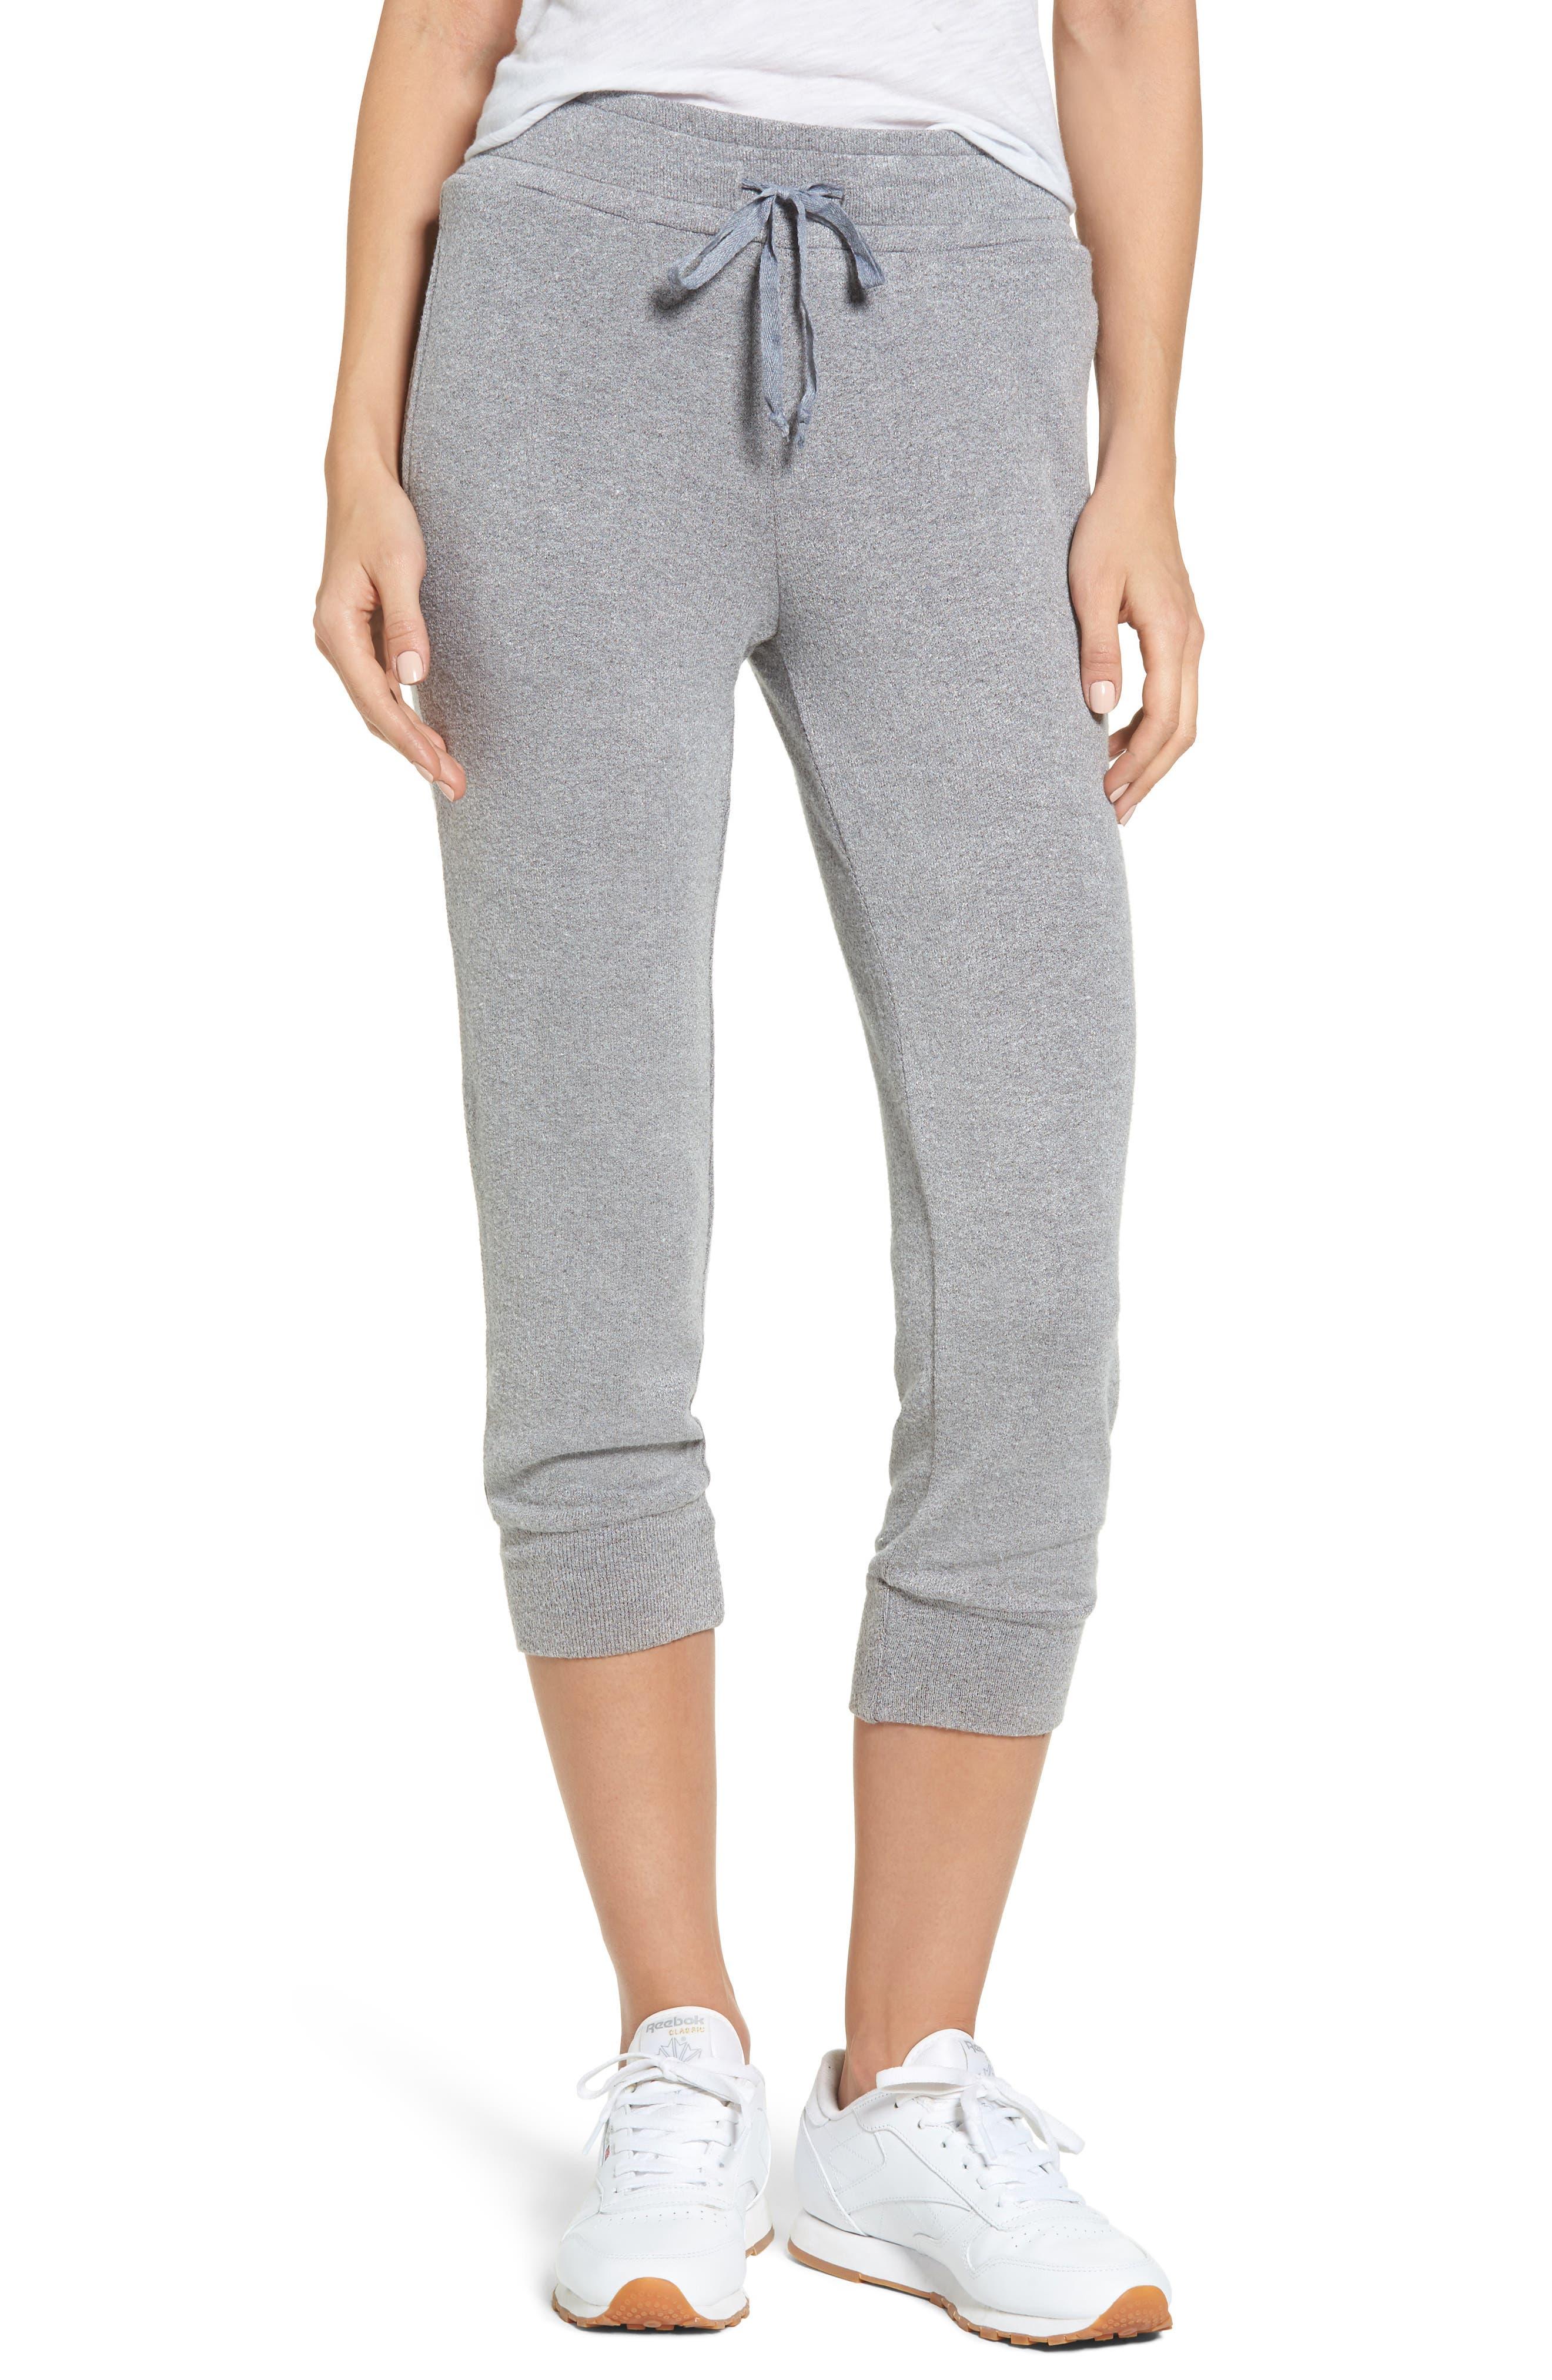 Flint Fleece Crop Jogger Pants,                         Main,                         color, Heather Grey